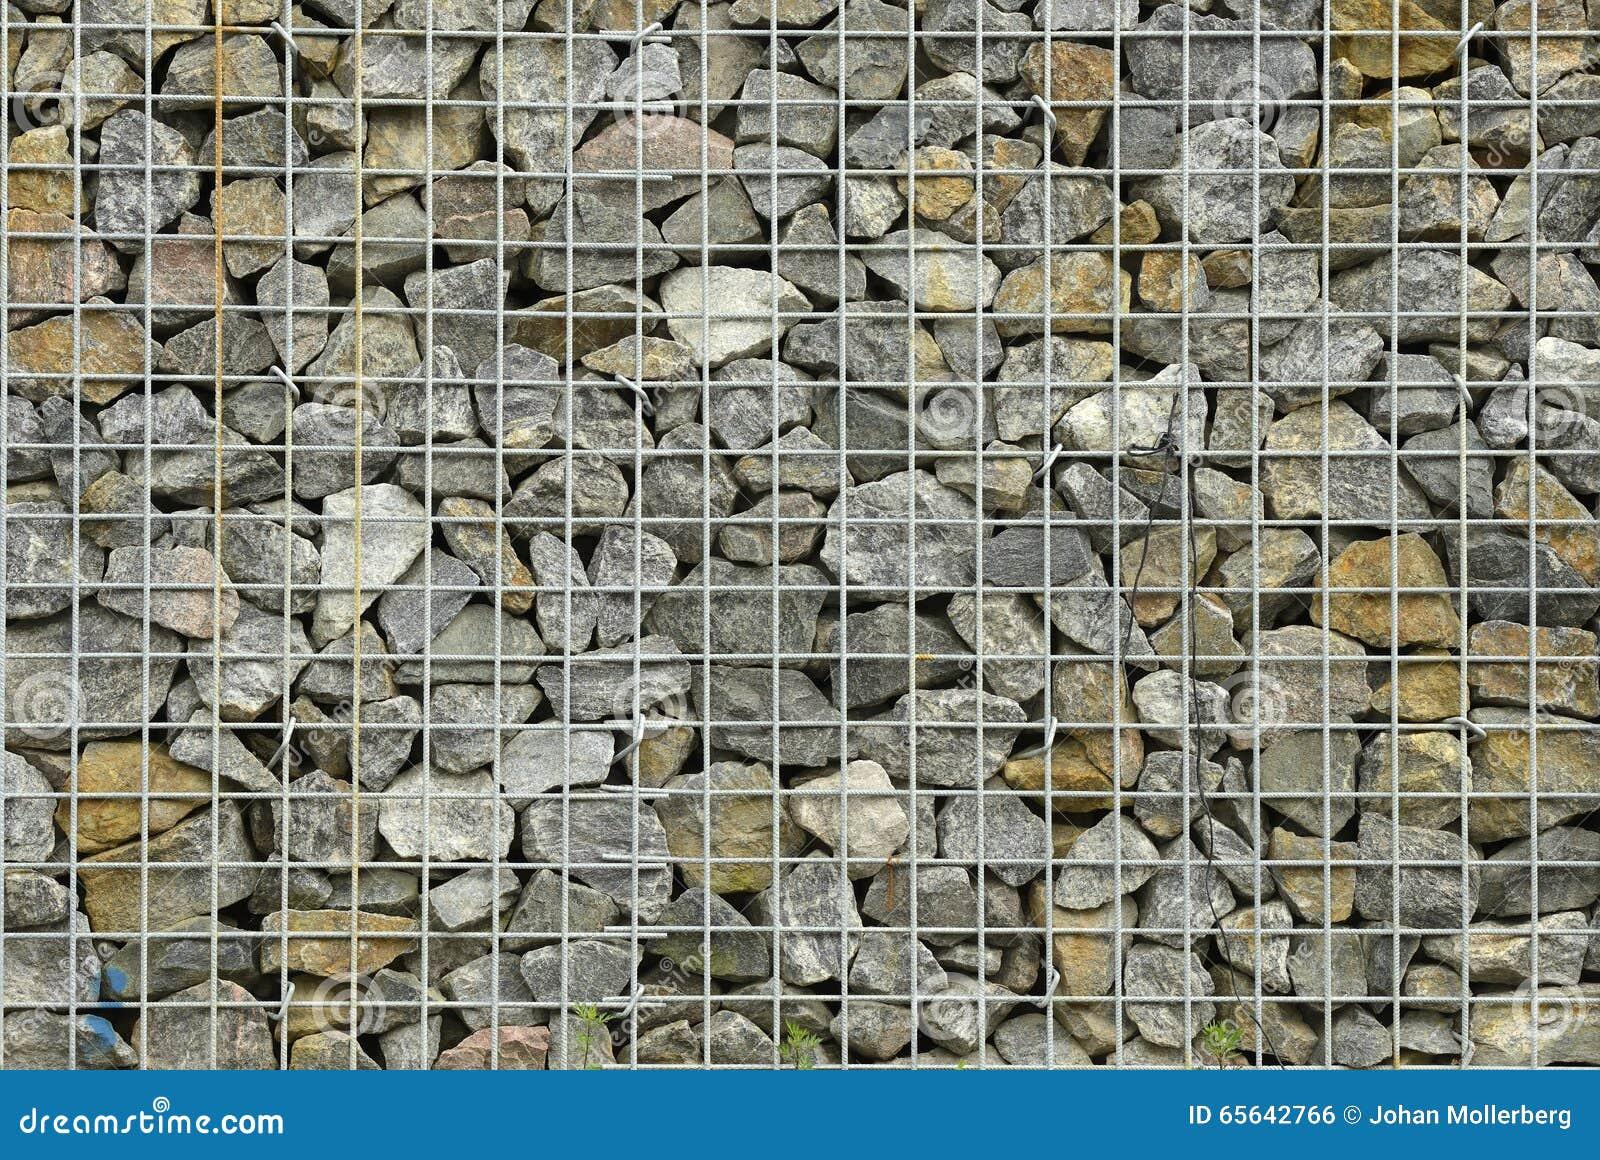 Gril en pierre et en acier